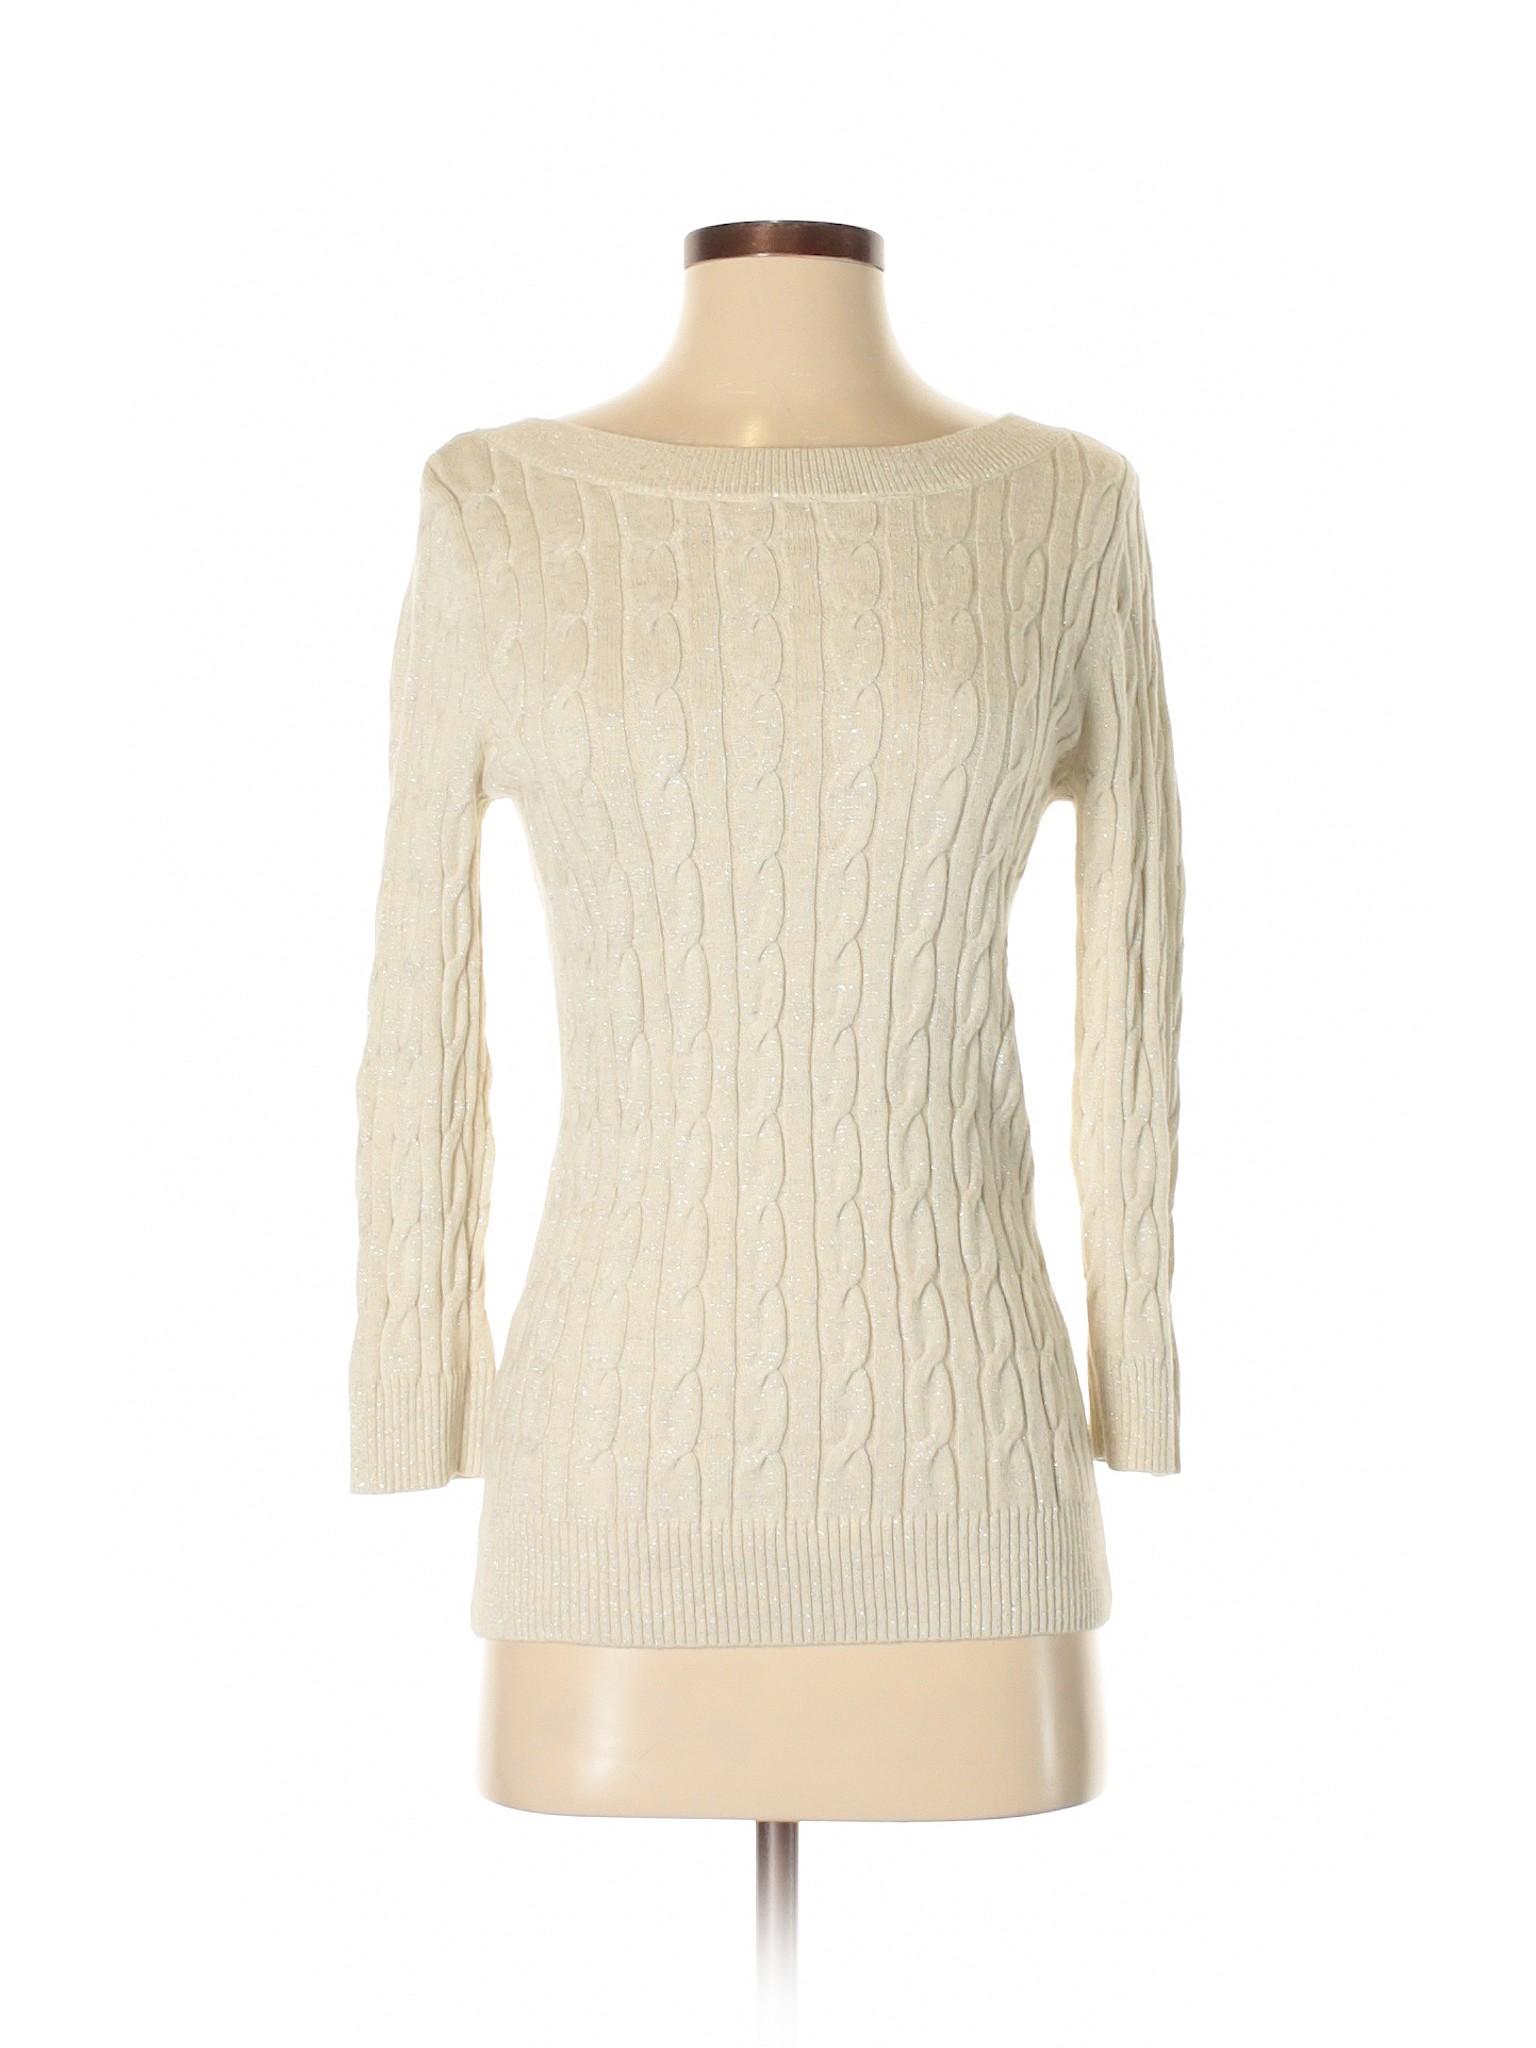 Taylor winter Sweater Ann Pullover Boutique Outlet LOFT wTa6OaRqxF